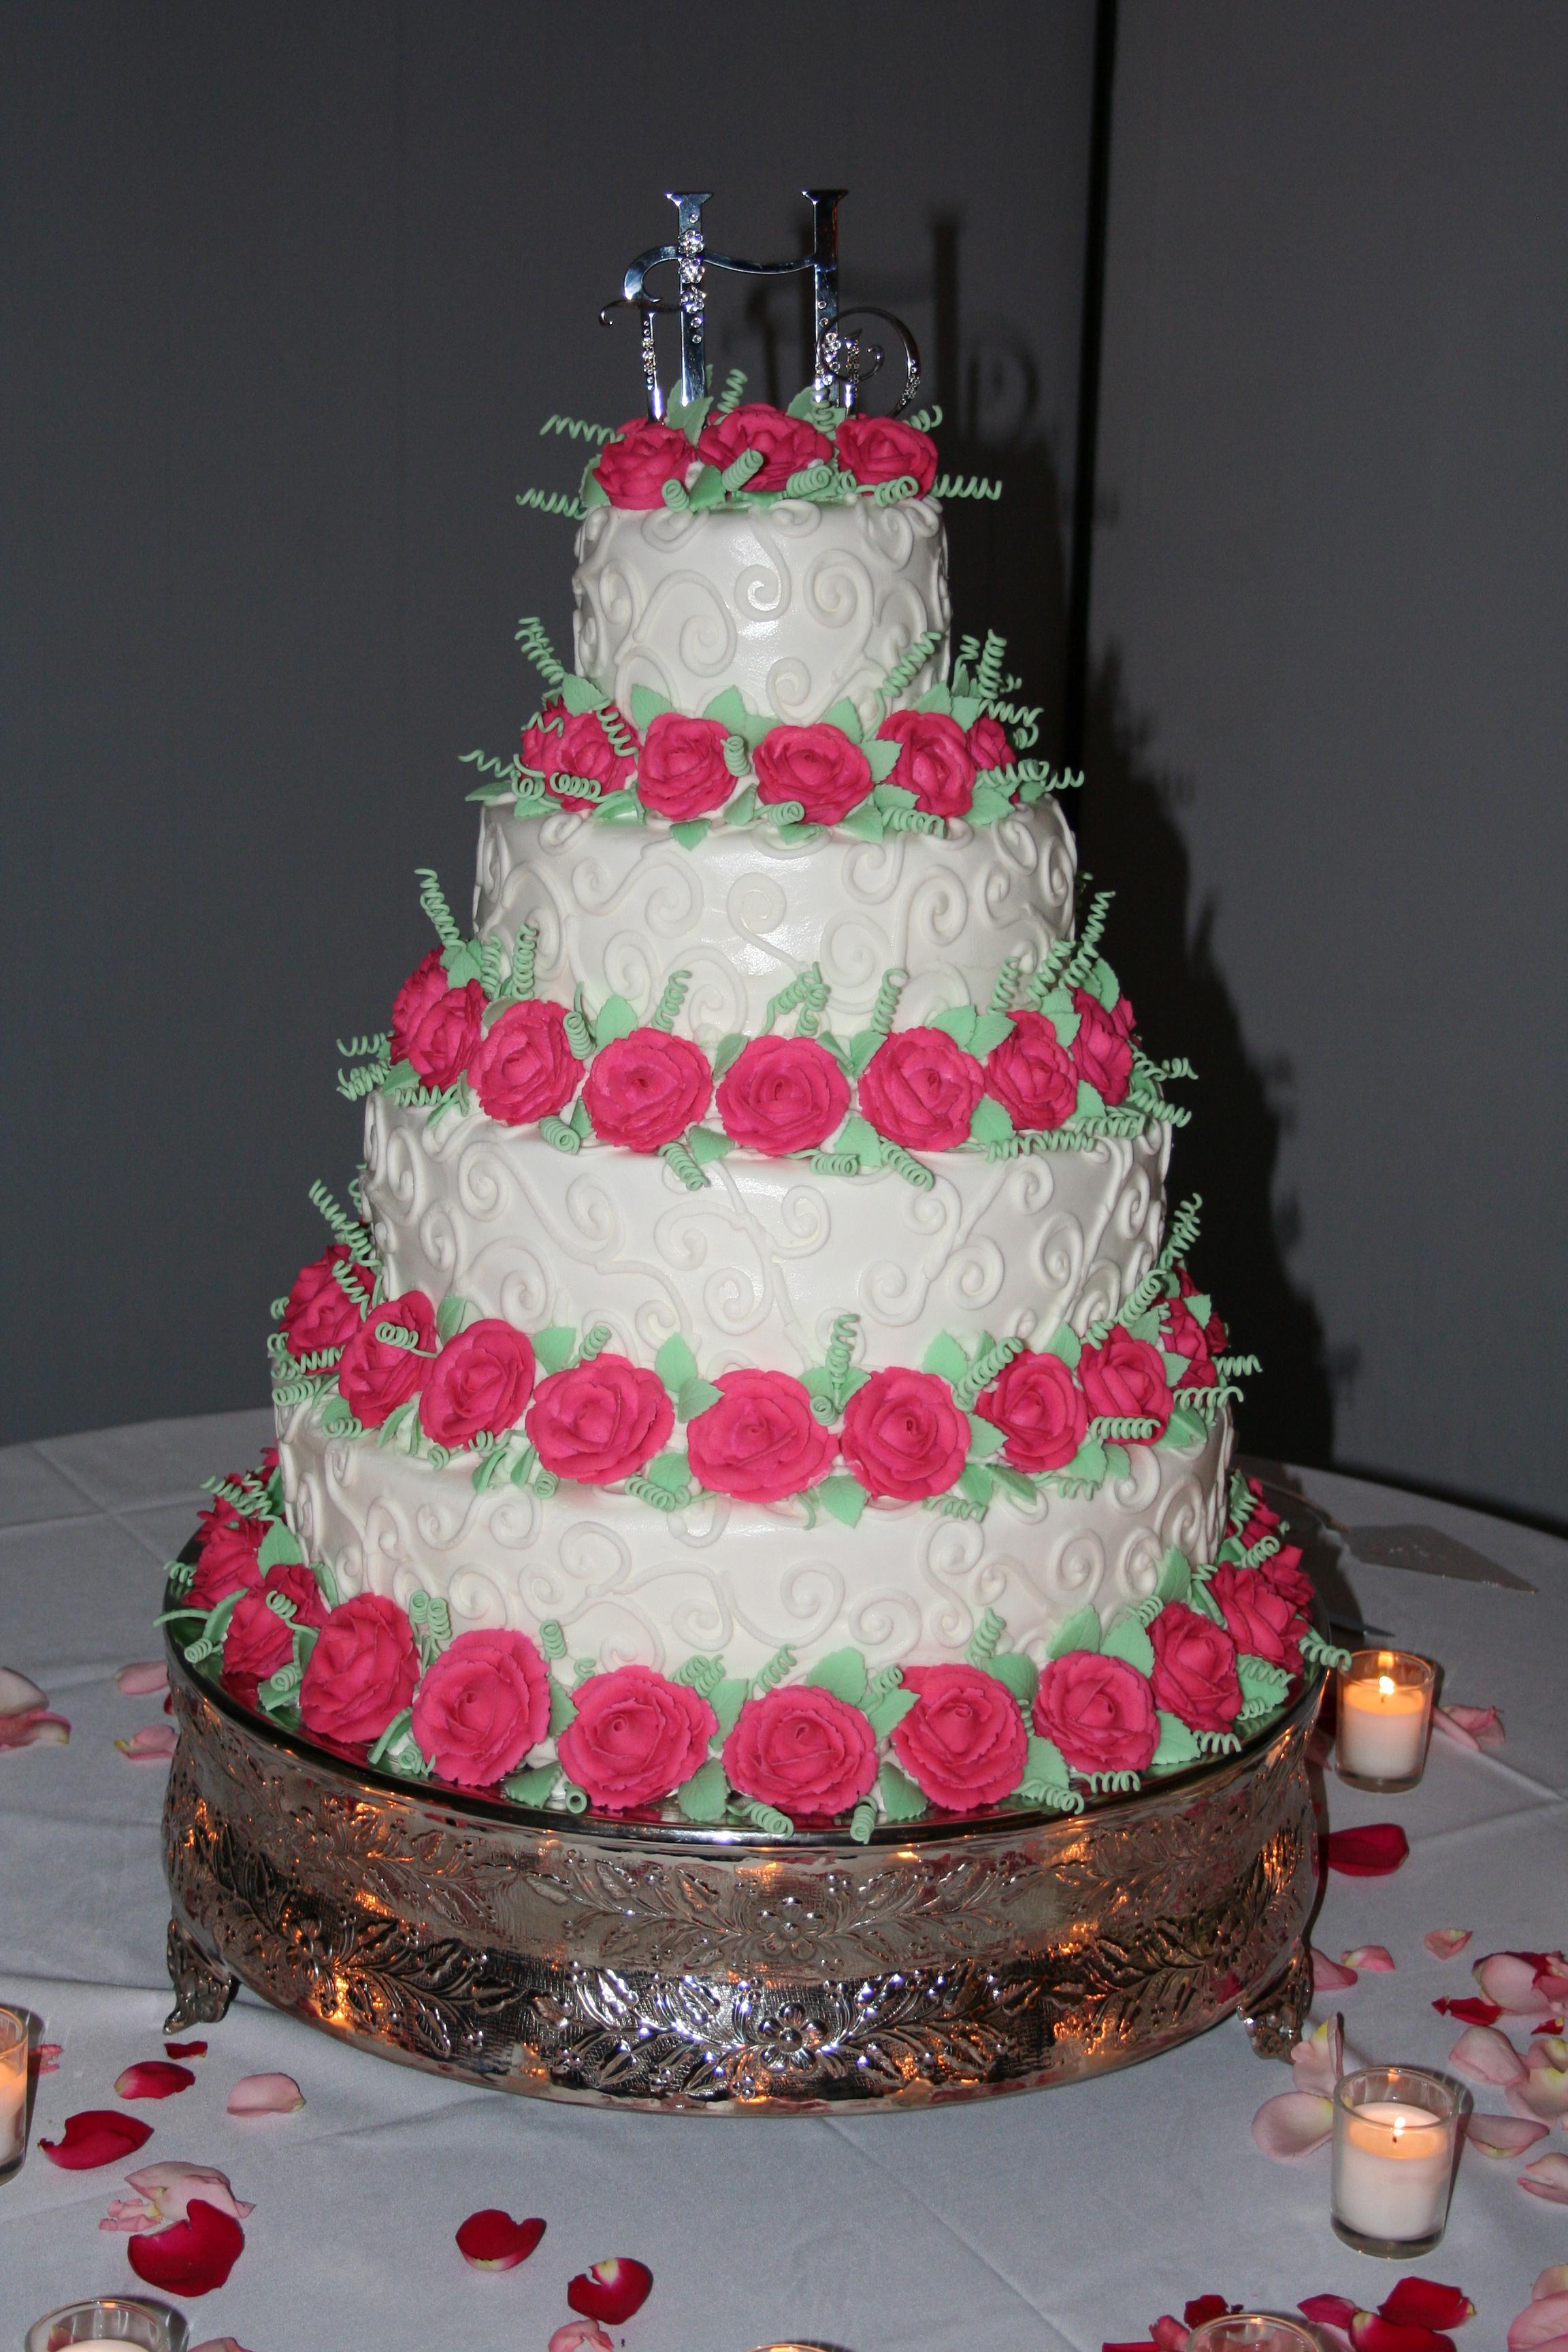 Making My Own Wedding Cake Stitch Fancy